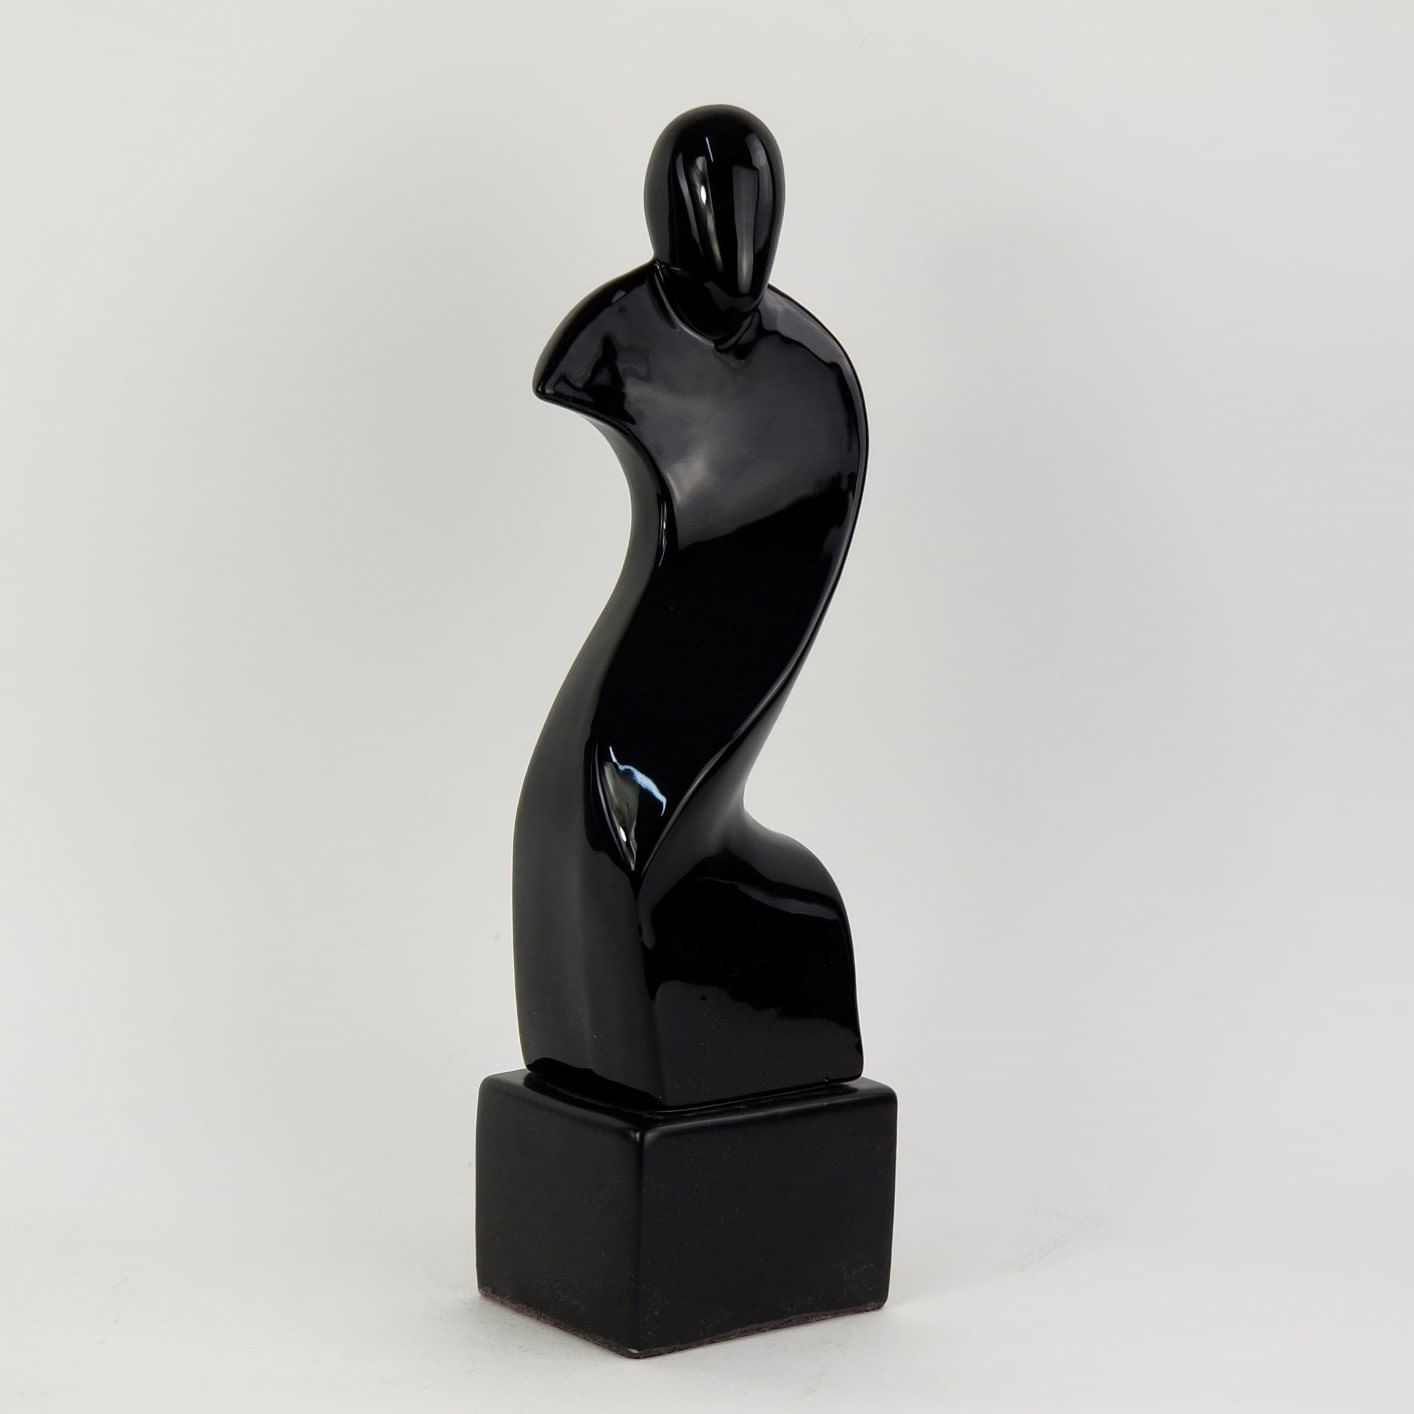 Escultura / Estatueta Preta Decorativa Forma de Homem e Base